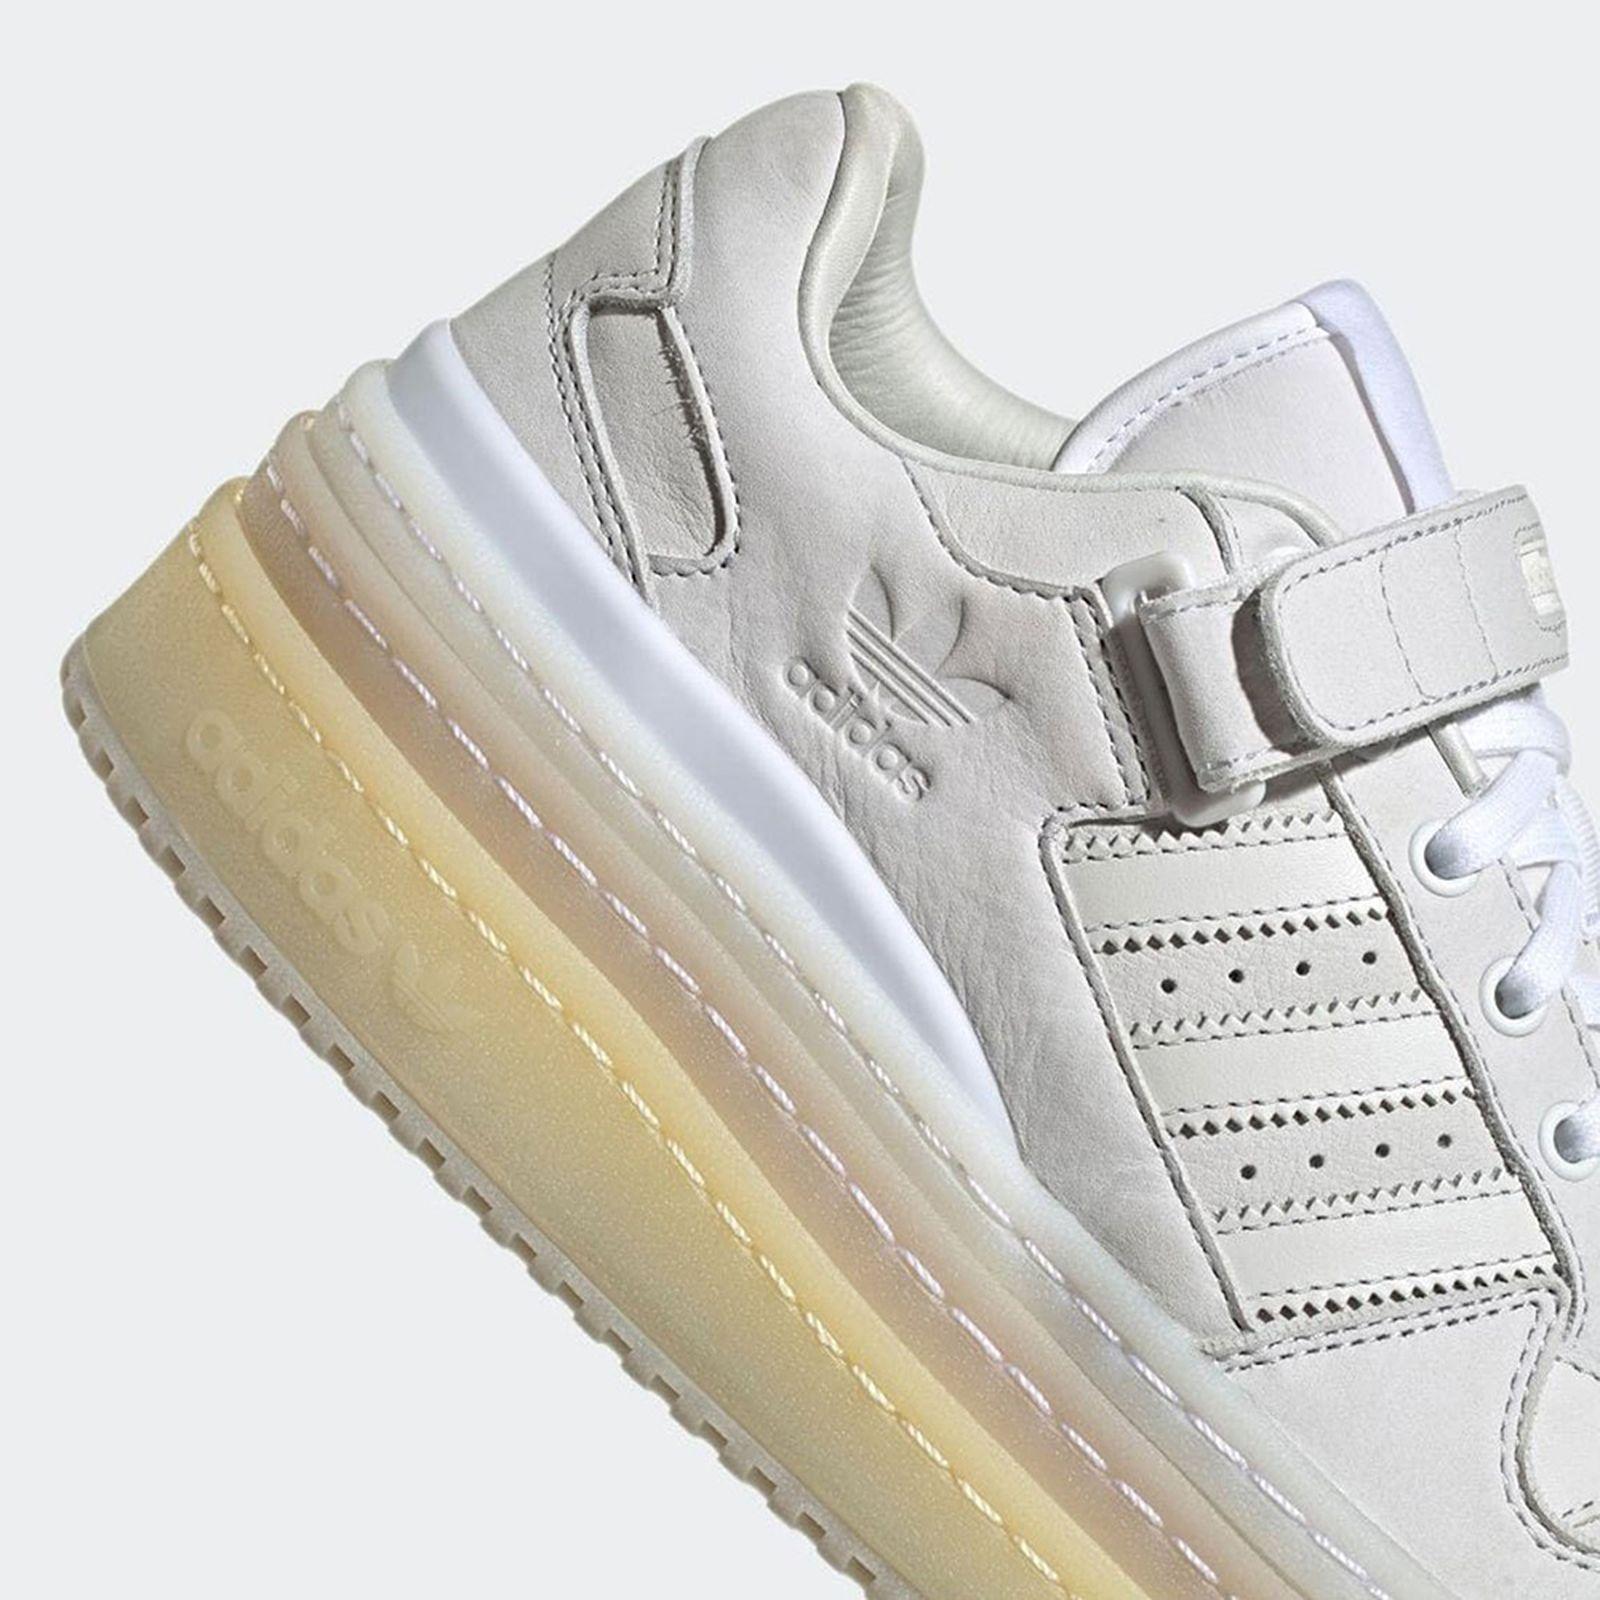 adidas-triple-platforum-lo-crystal-white-release-date-price-06